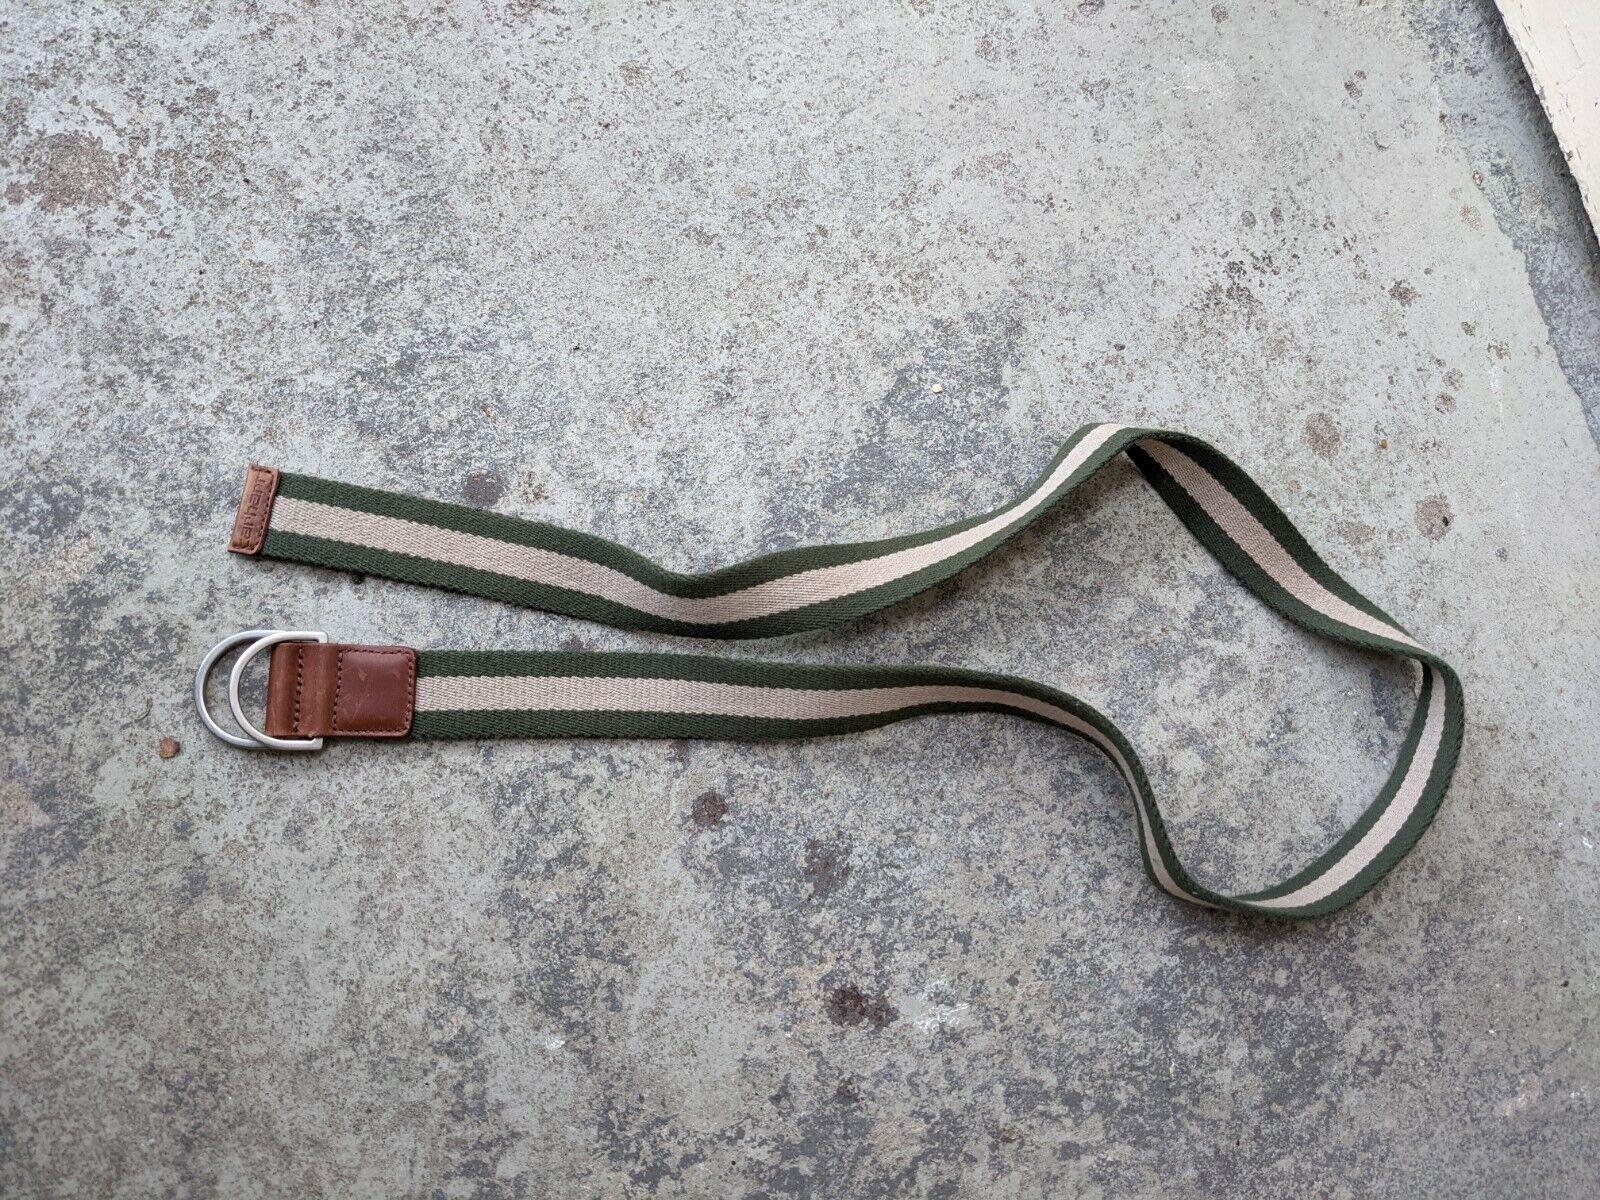 Carhartt Men's Belt Beige Green Leather 118cm